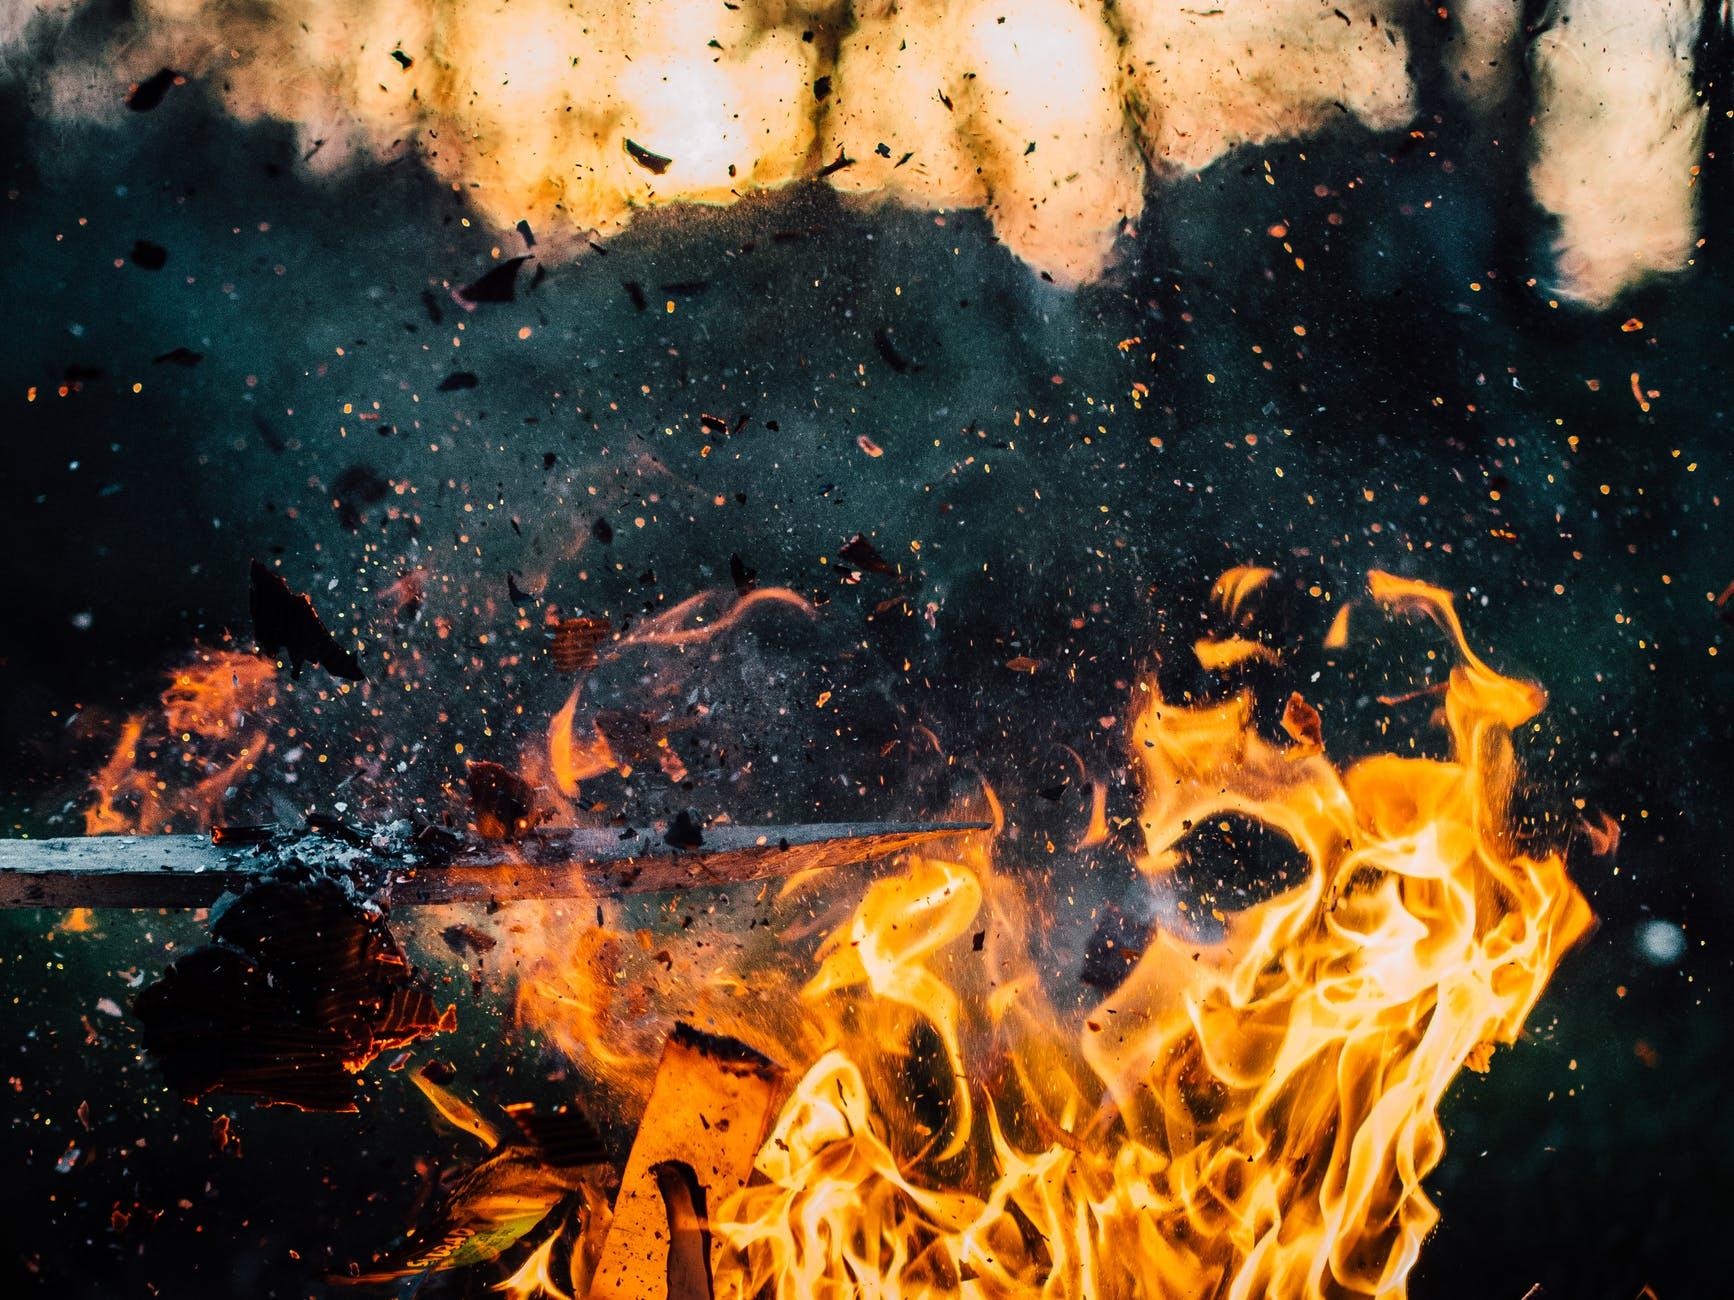 wood-explosion-fire-hot pexels lunasonline